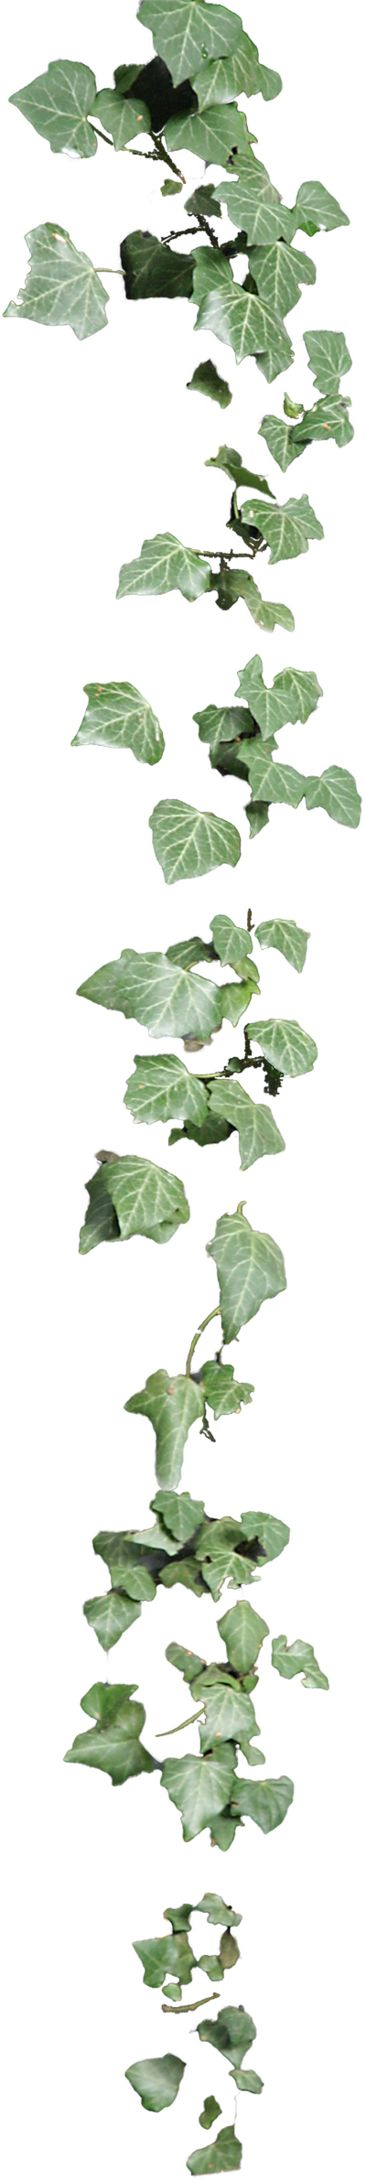 cutout plant hanging ivy | Cutout | Pinterest | Ivy, Art and Plants Purple Top Border Clip Art